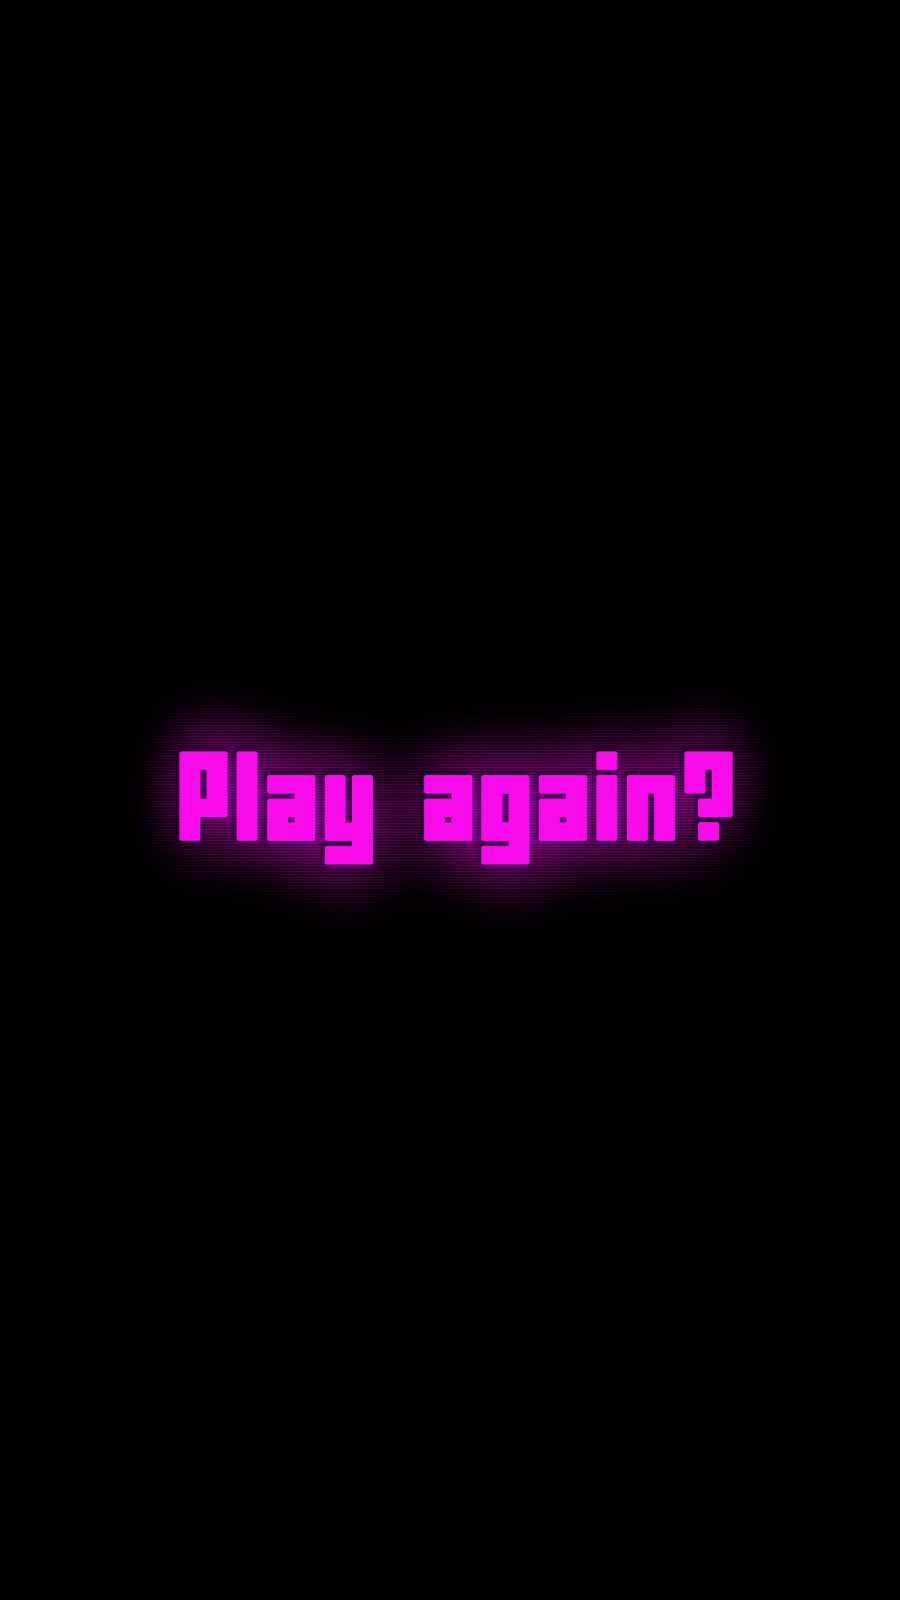 Play Again iPhone Wallpaper